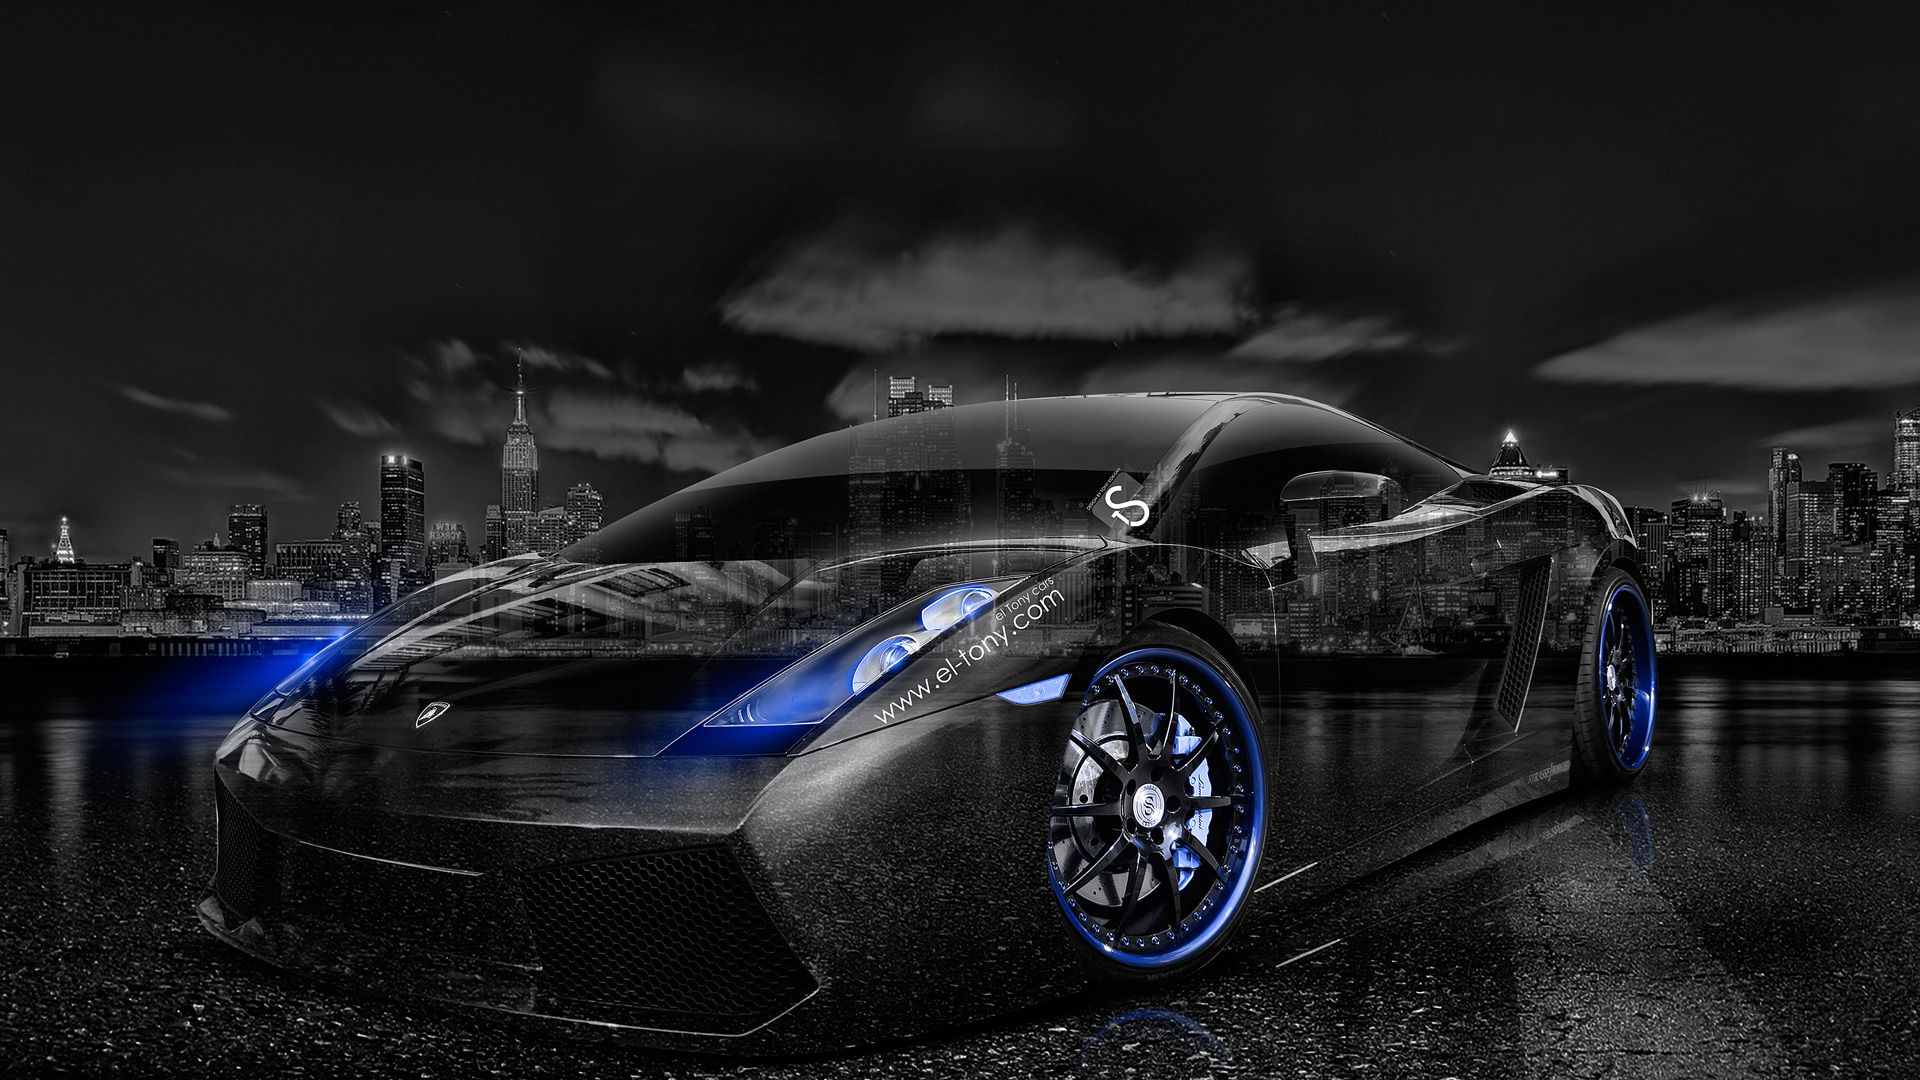 Amazing Lamborghini Gallardo Back Abstract Car Design By Tony Kokhan Wallpapers) U2013  HD Desktop Wallpapers